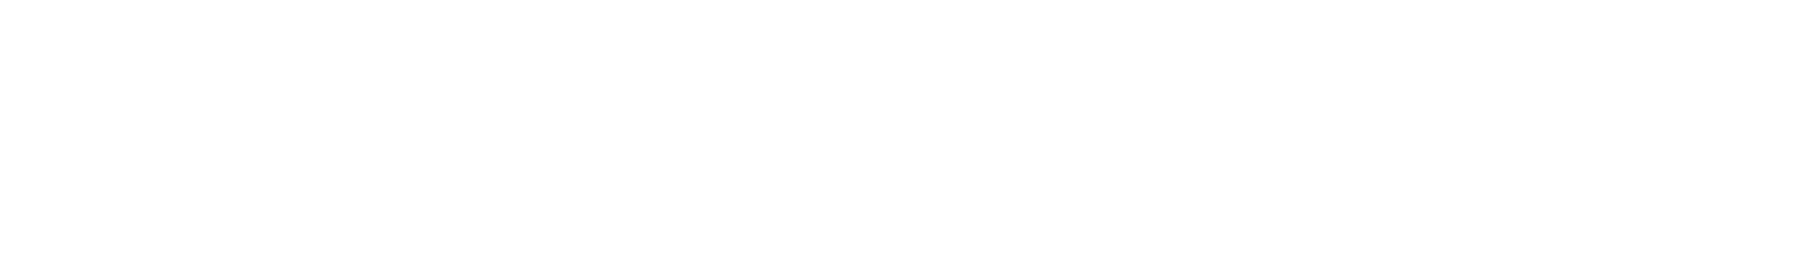 g abs05 058